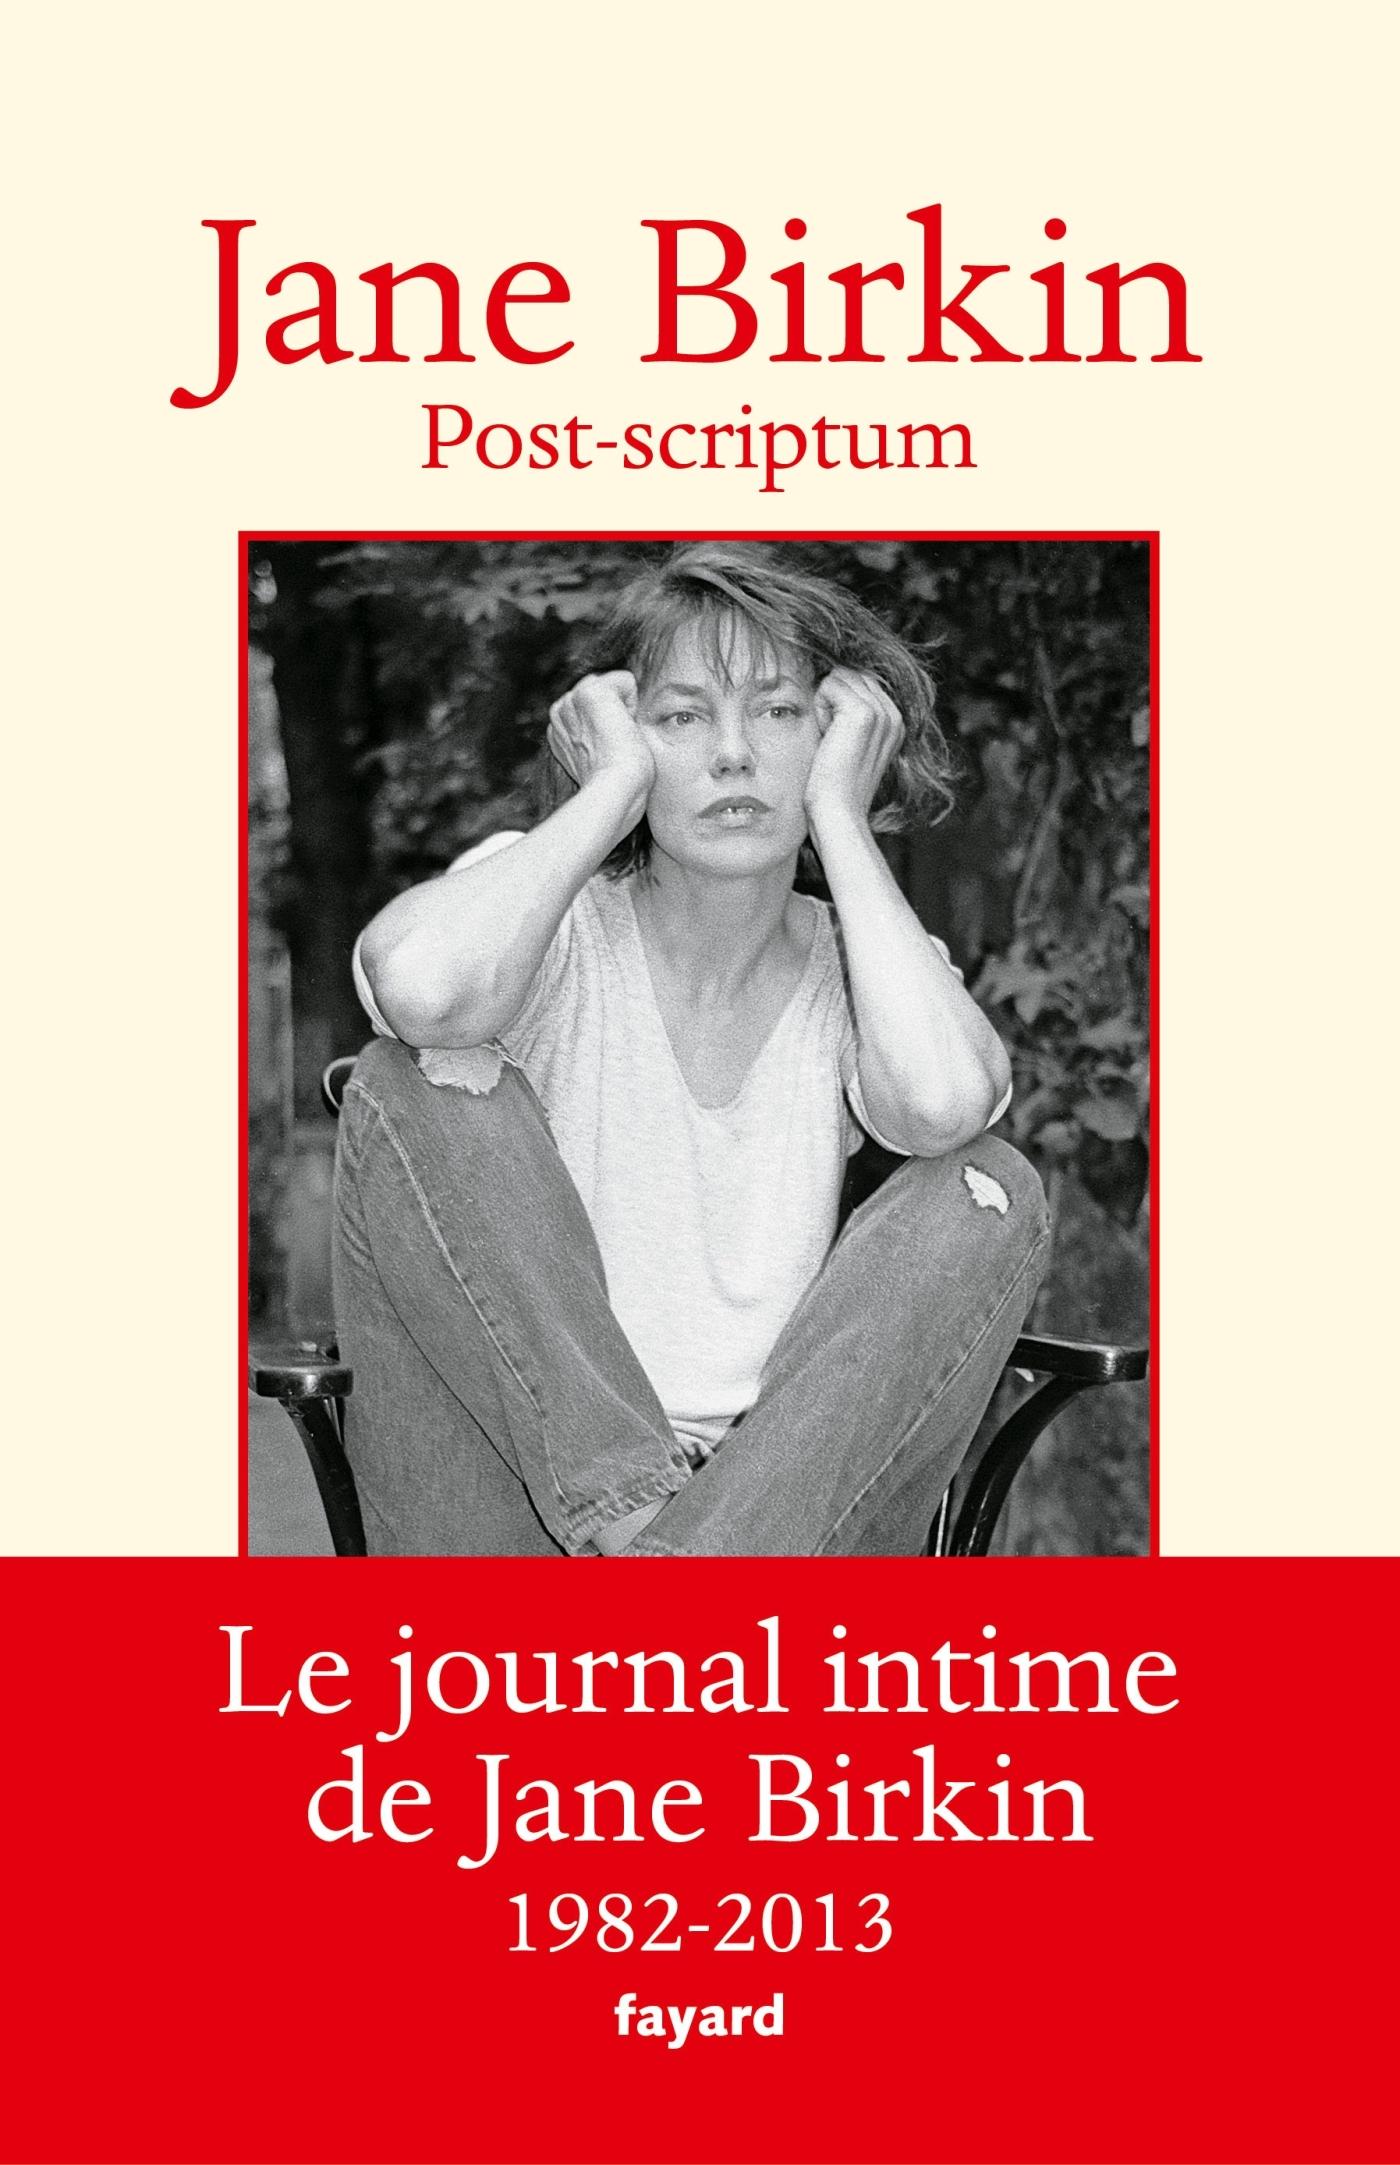 POST-SCRIPTUM - LE JOURNAL INTIME DE JANE BIRKIN 1982-2013